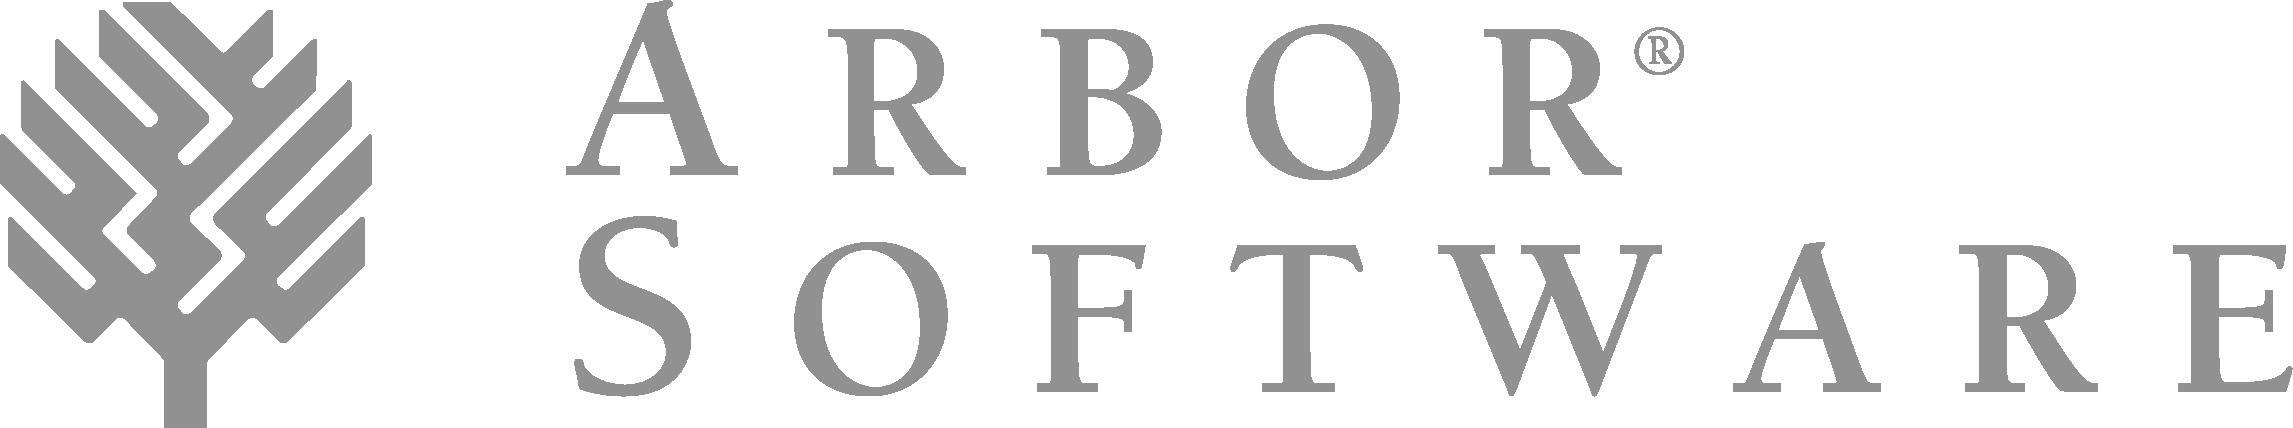 Arbor Software